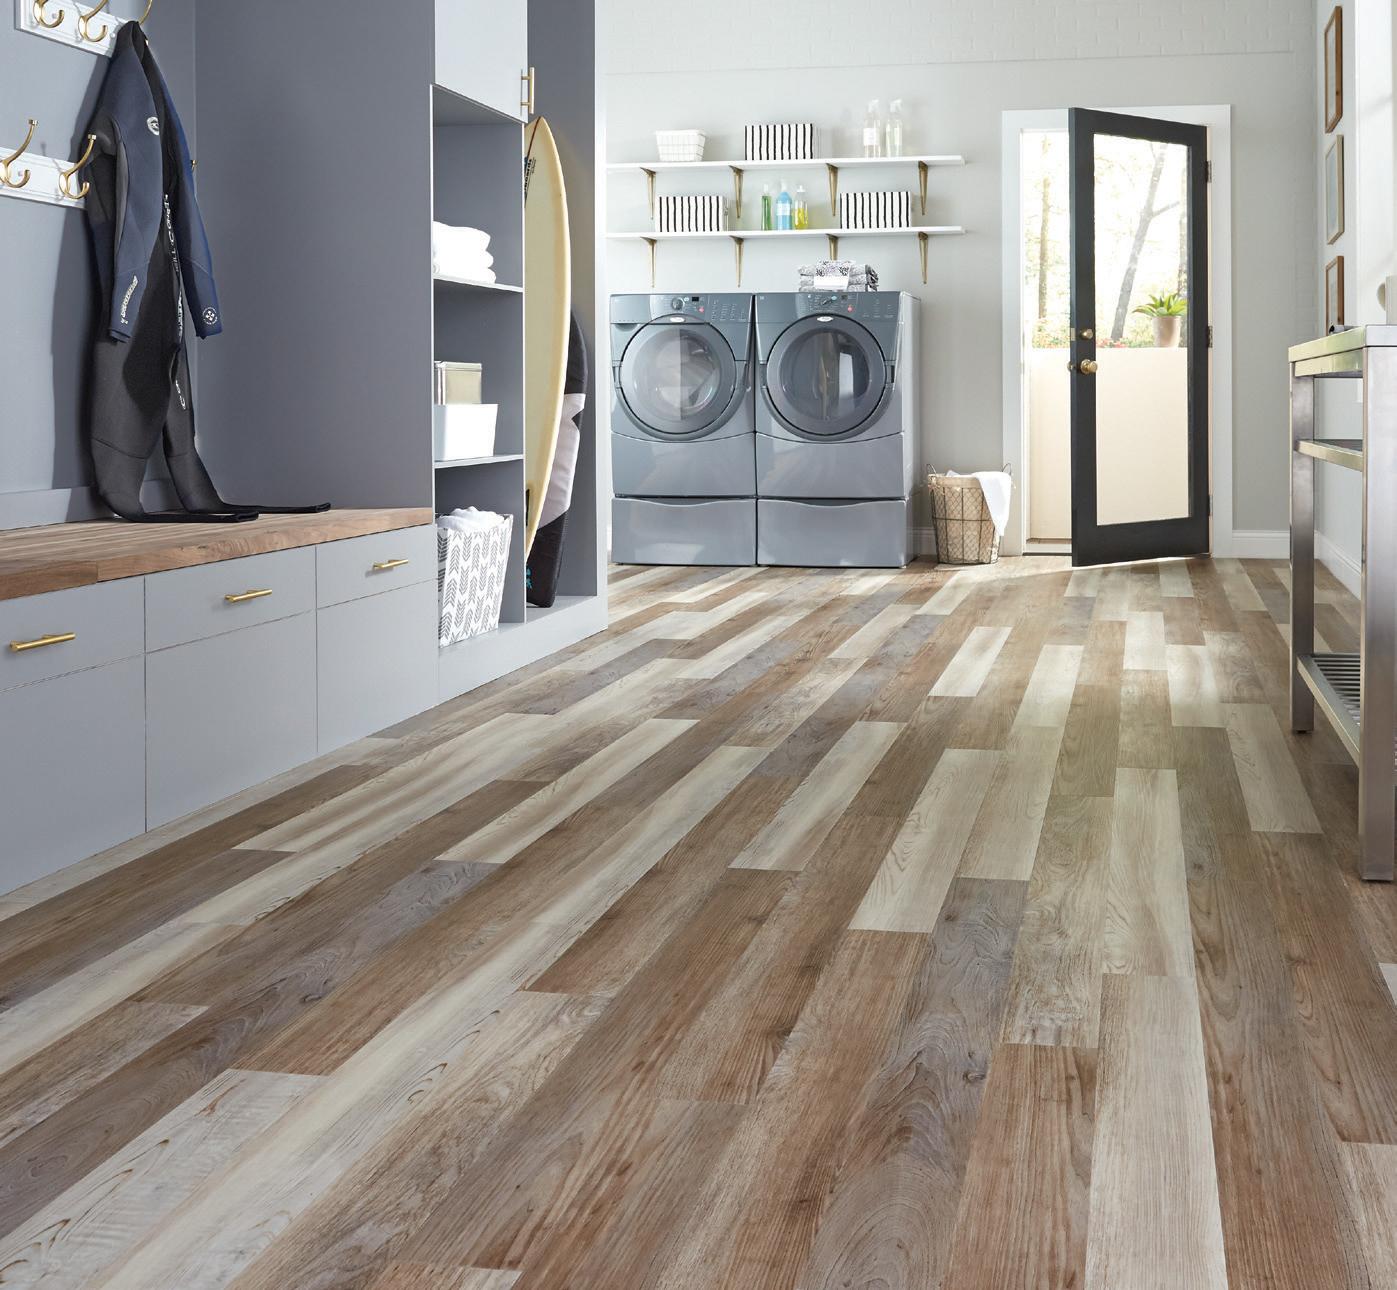 Is Tarkett Laminate Flooring Waterproof Laminate